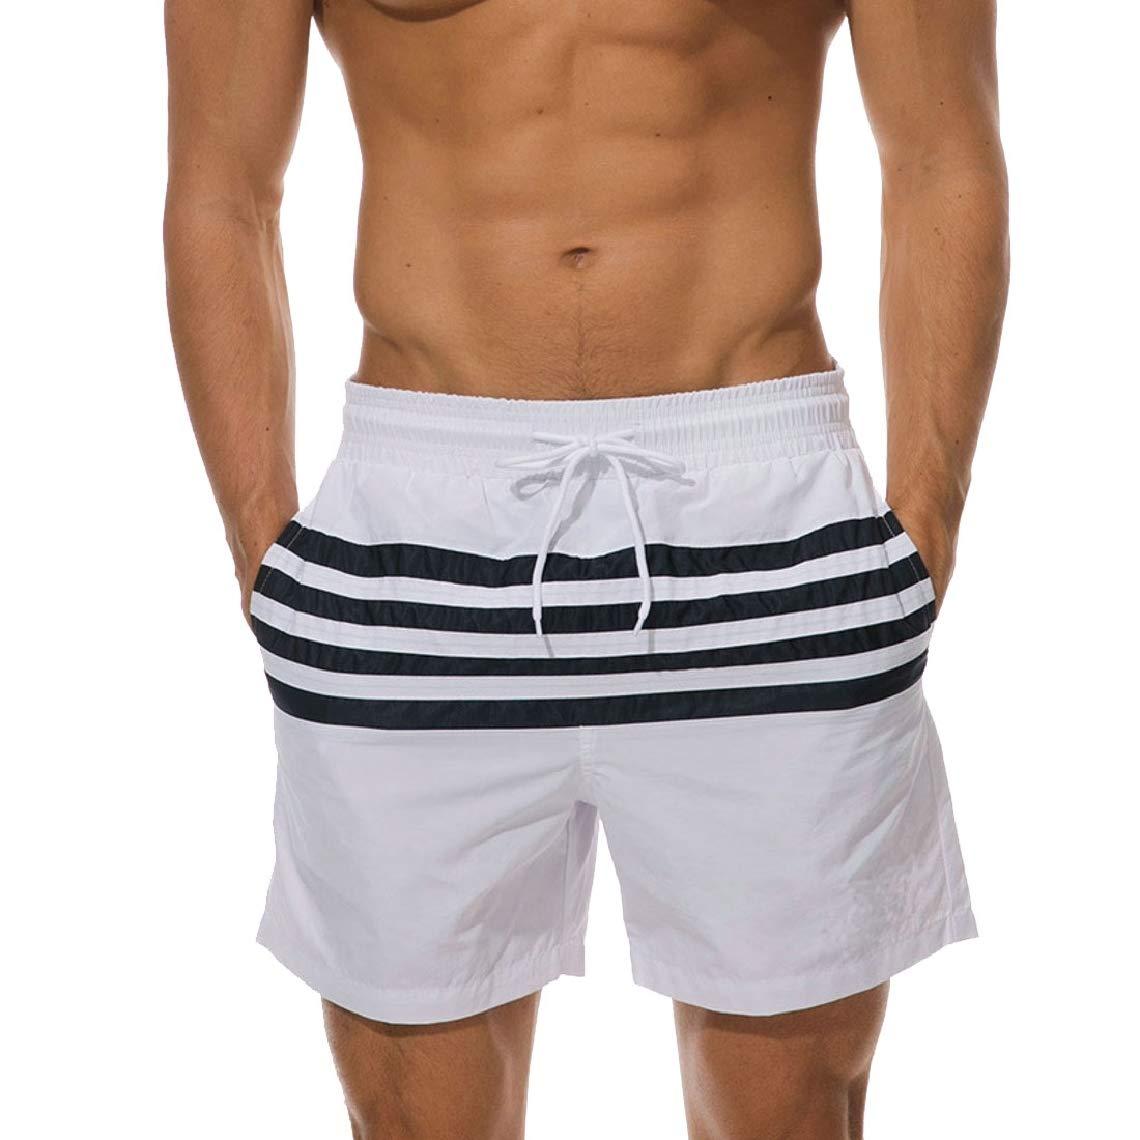 Mens Swim Fast Dry Casual Trunks Quick Beachwear Boardshorts